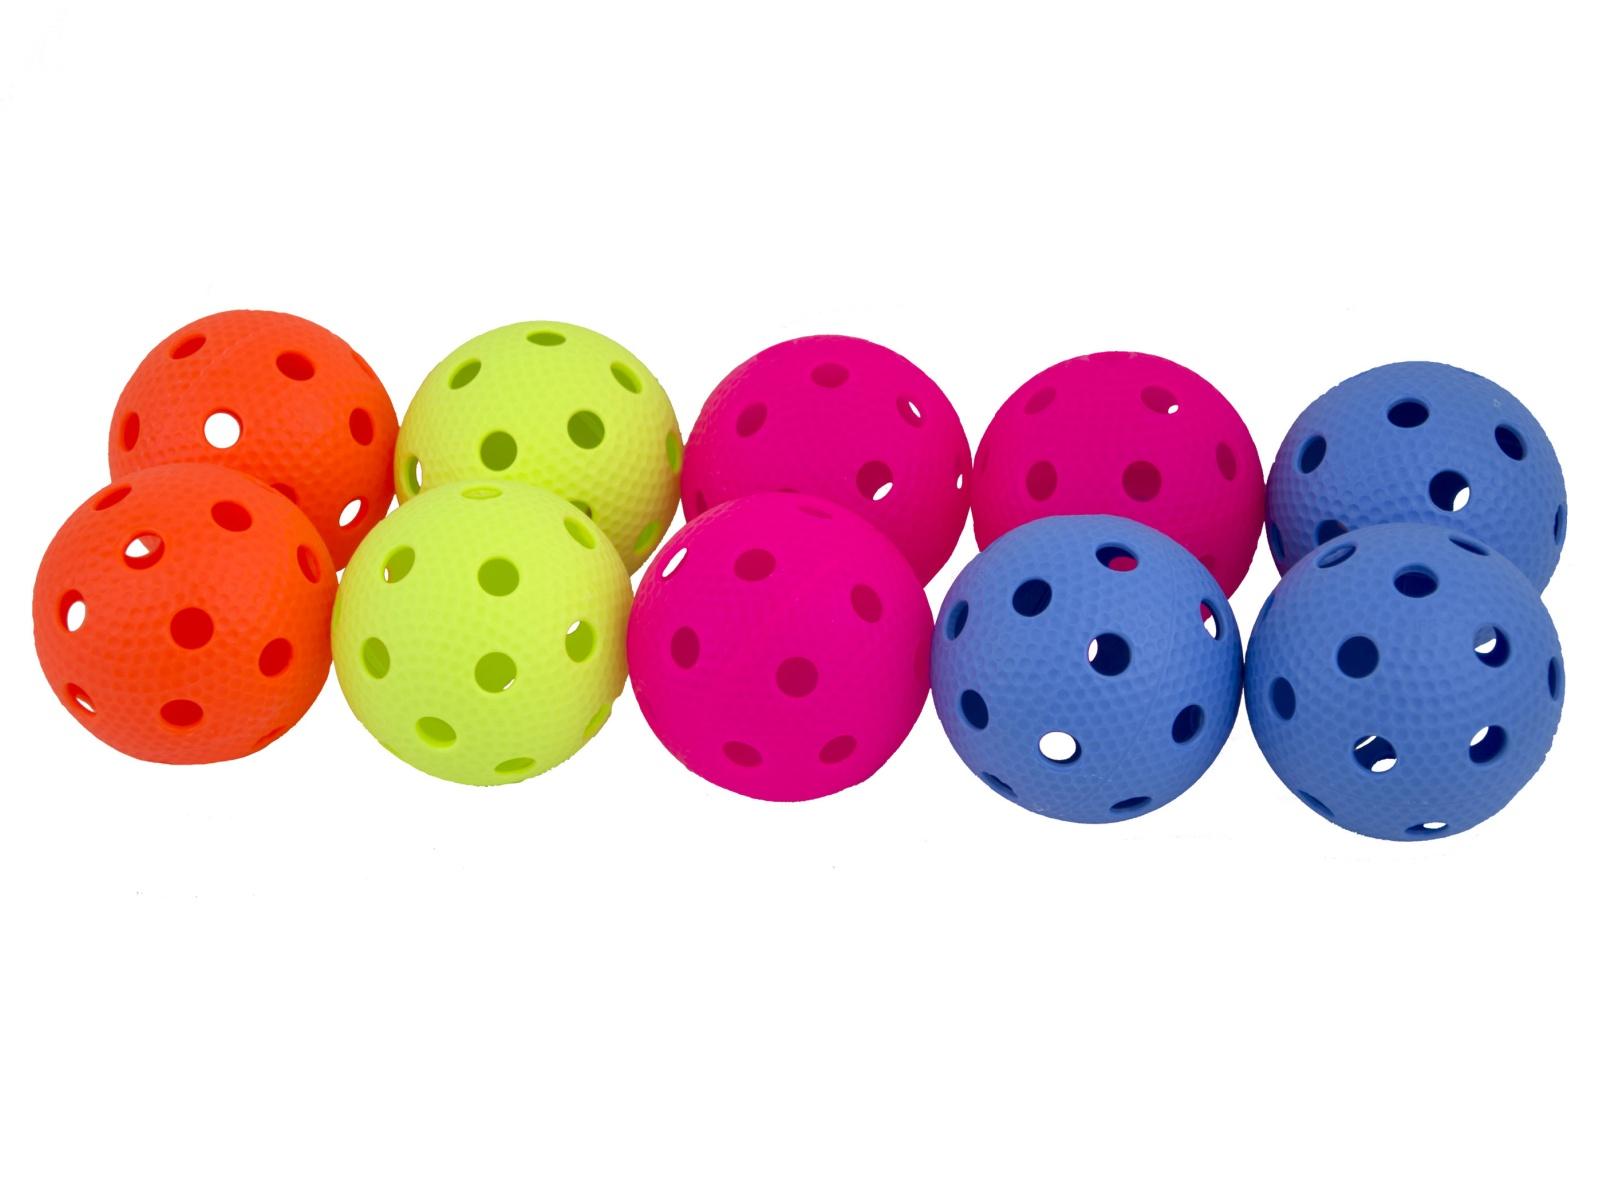 Florbalový míček SALMING Aero Ball 10 ks, barevný mix